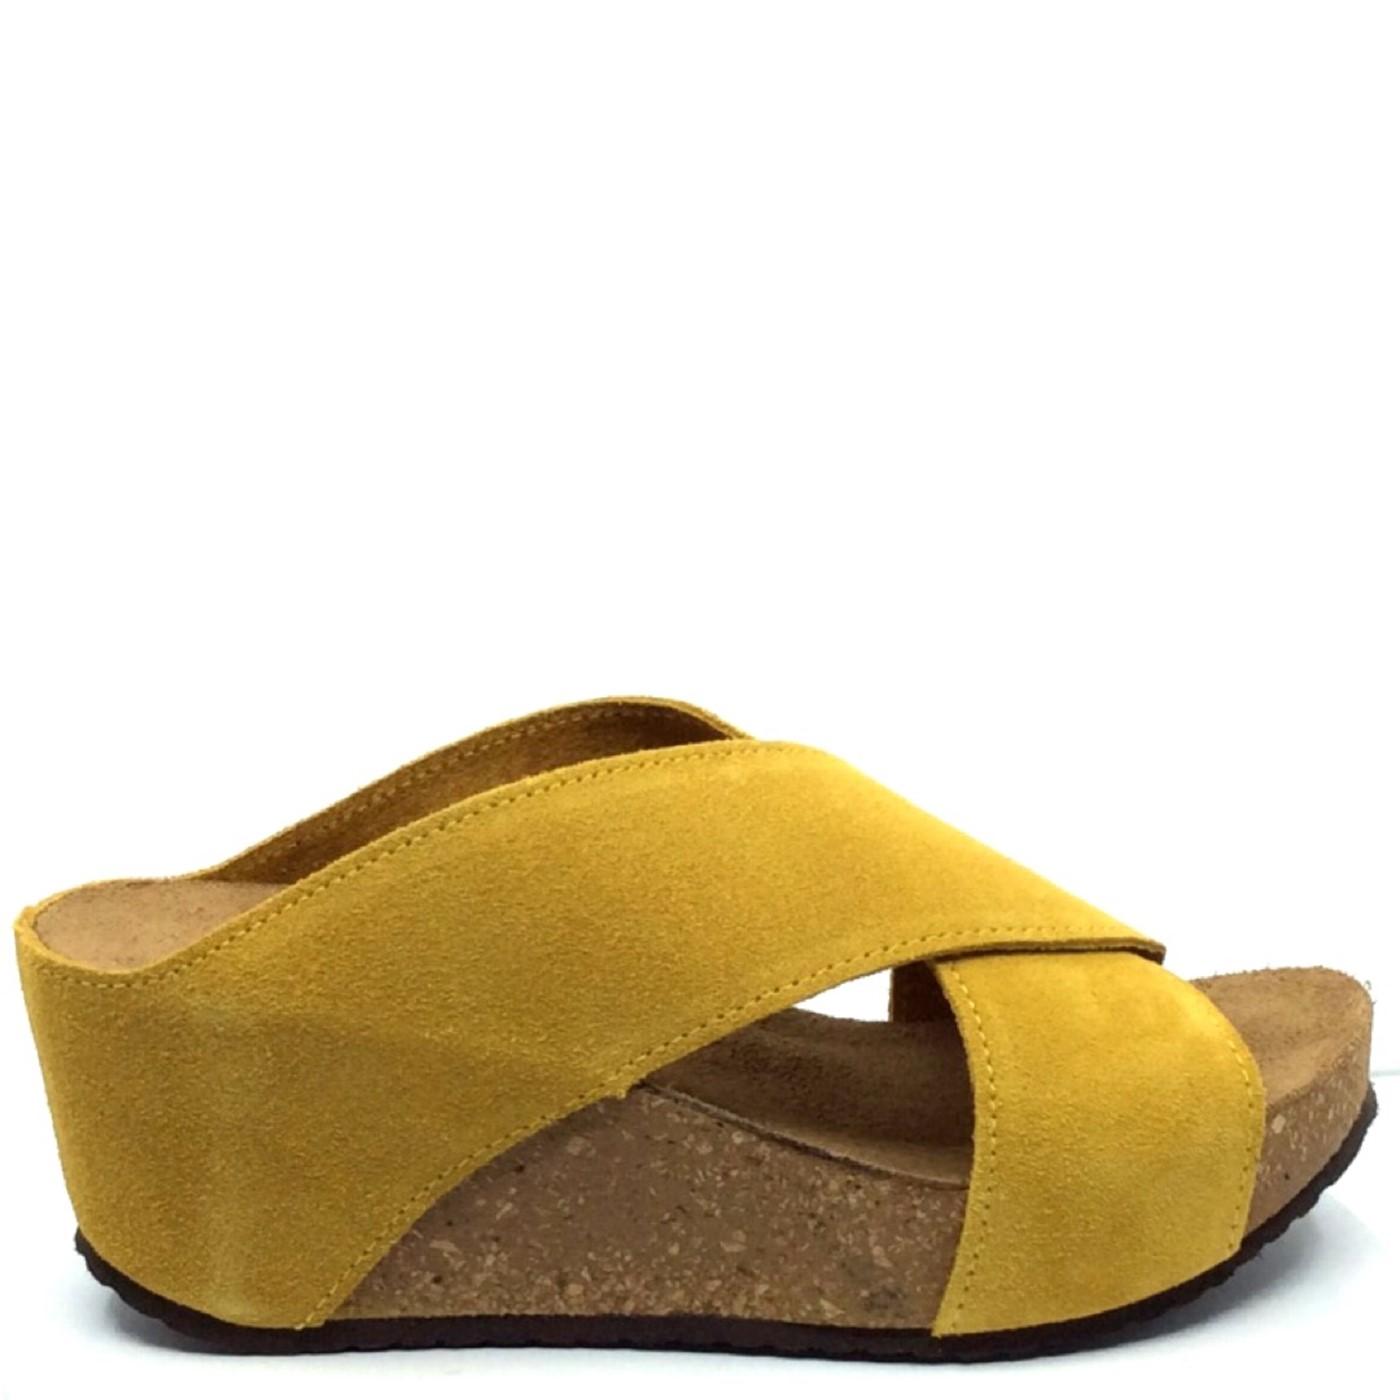 b7246740e6a4 Copenhagen shoes 2016 frances (19-cs1799) gul